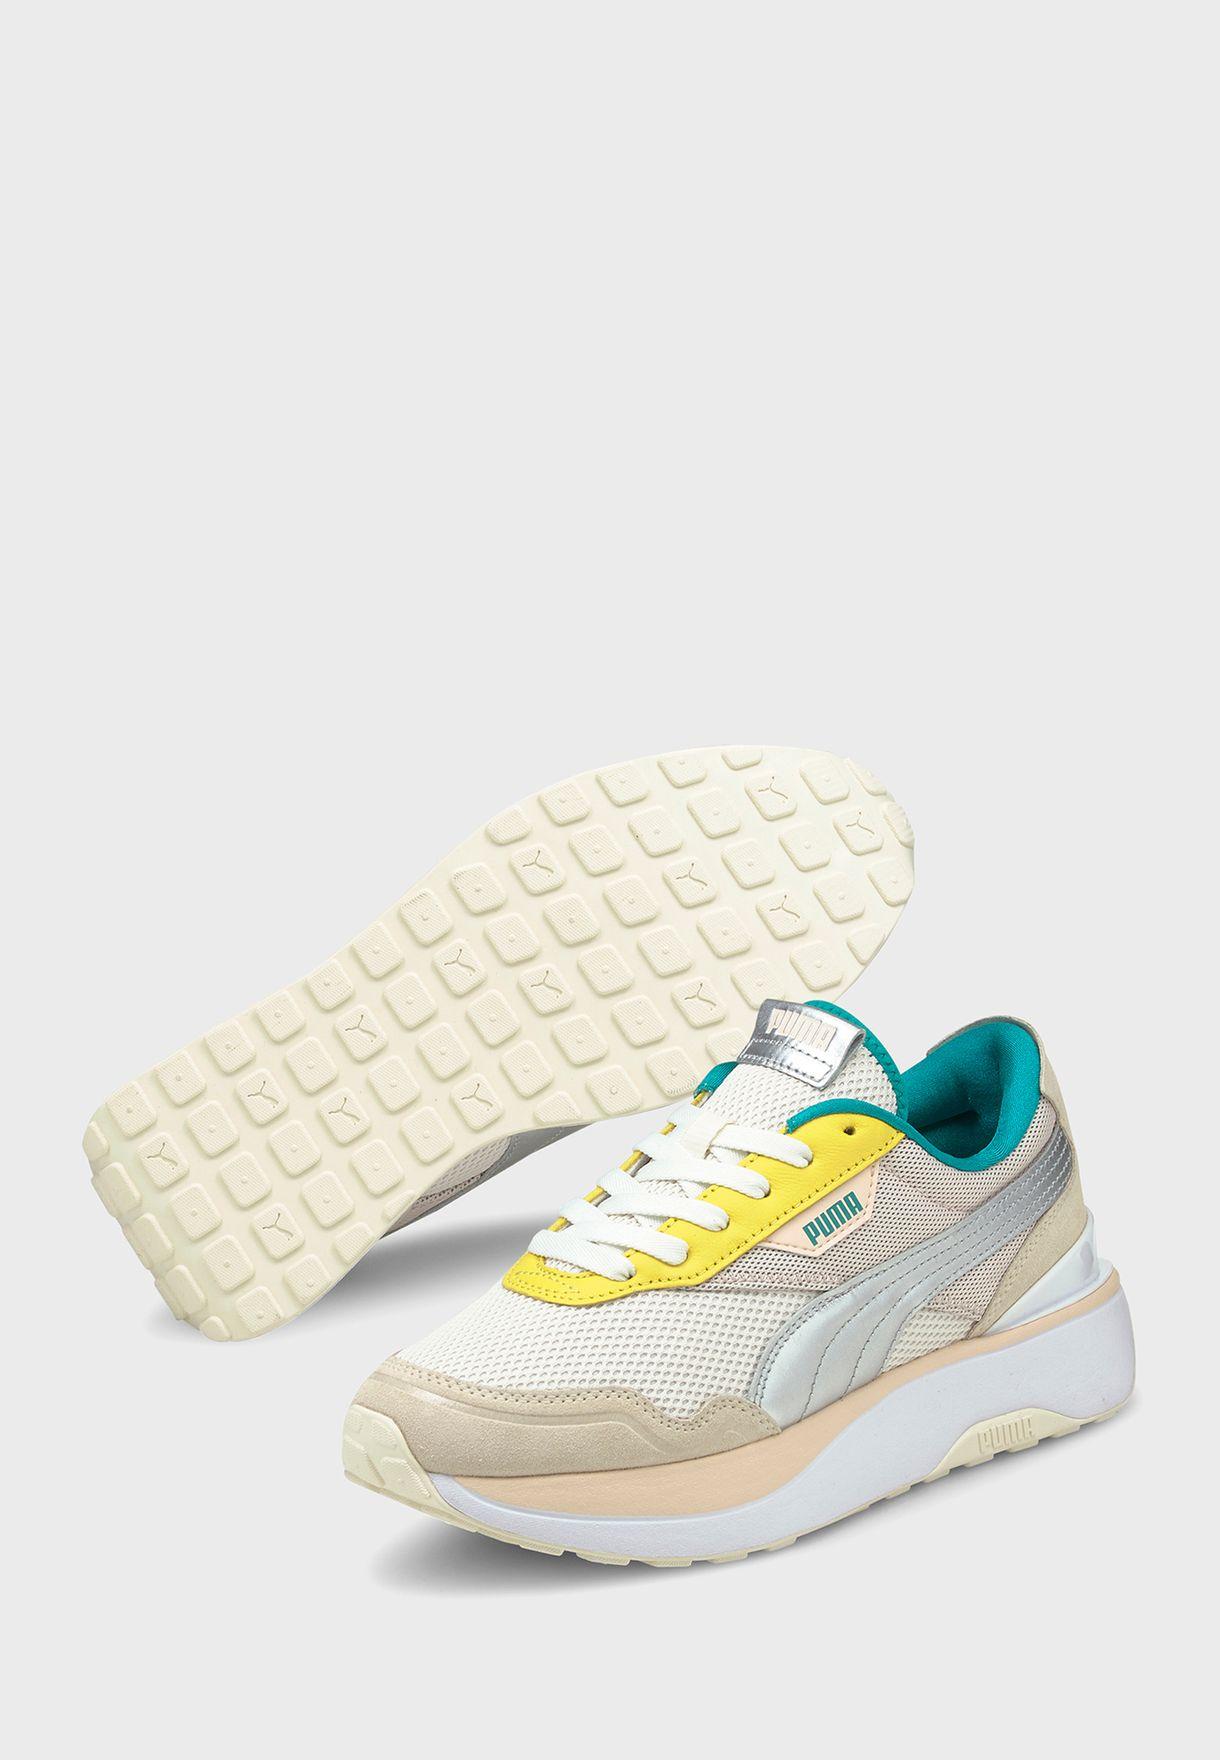 حذاء كروز رادير او كيو